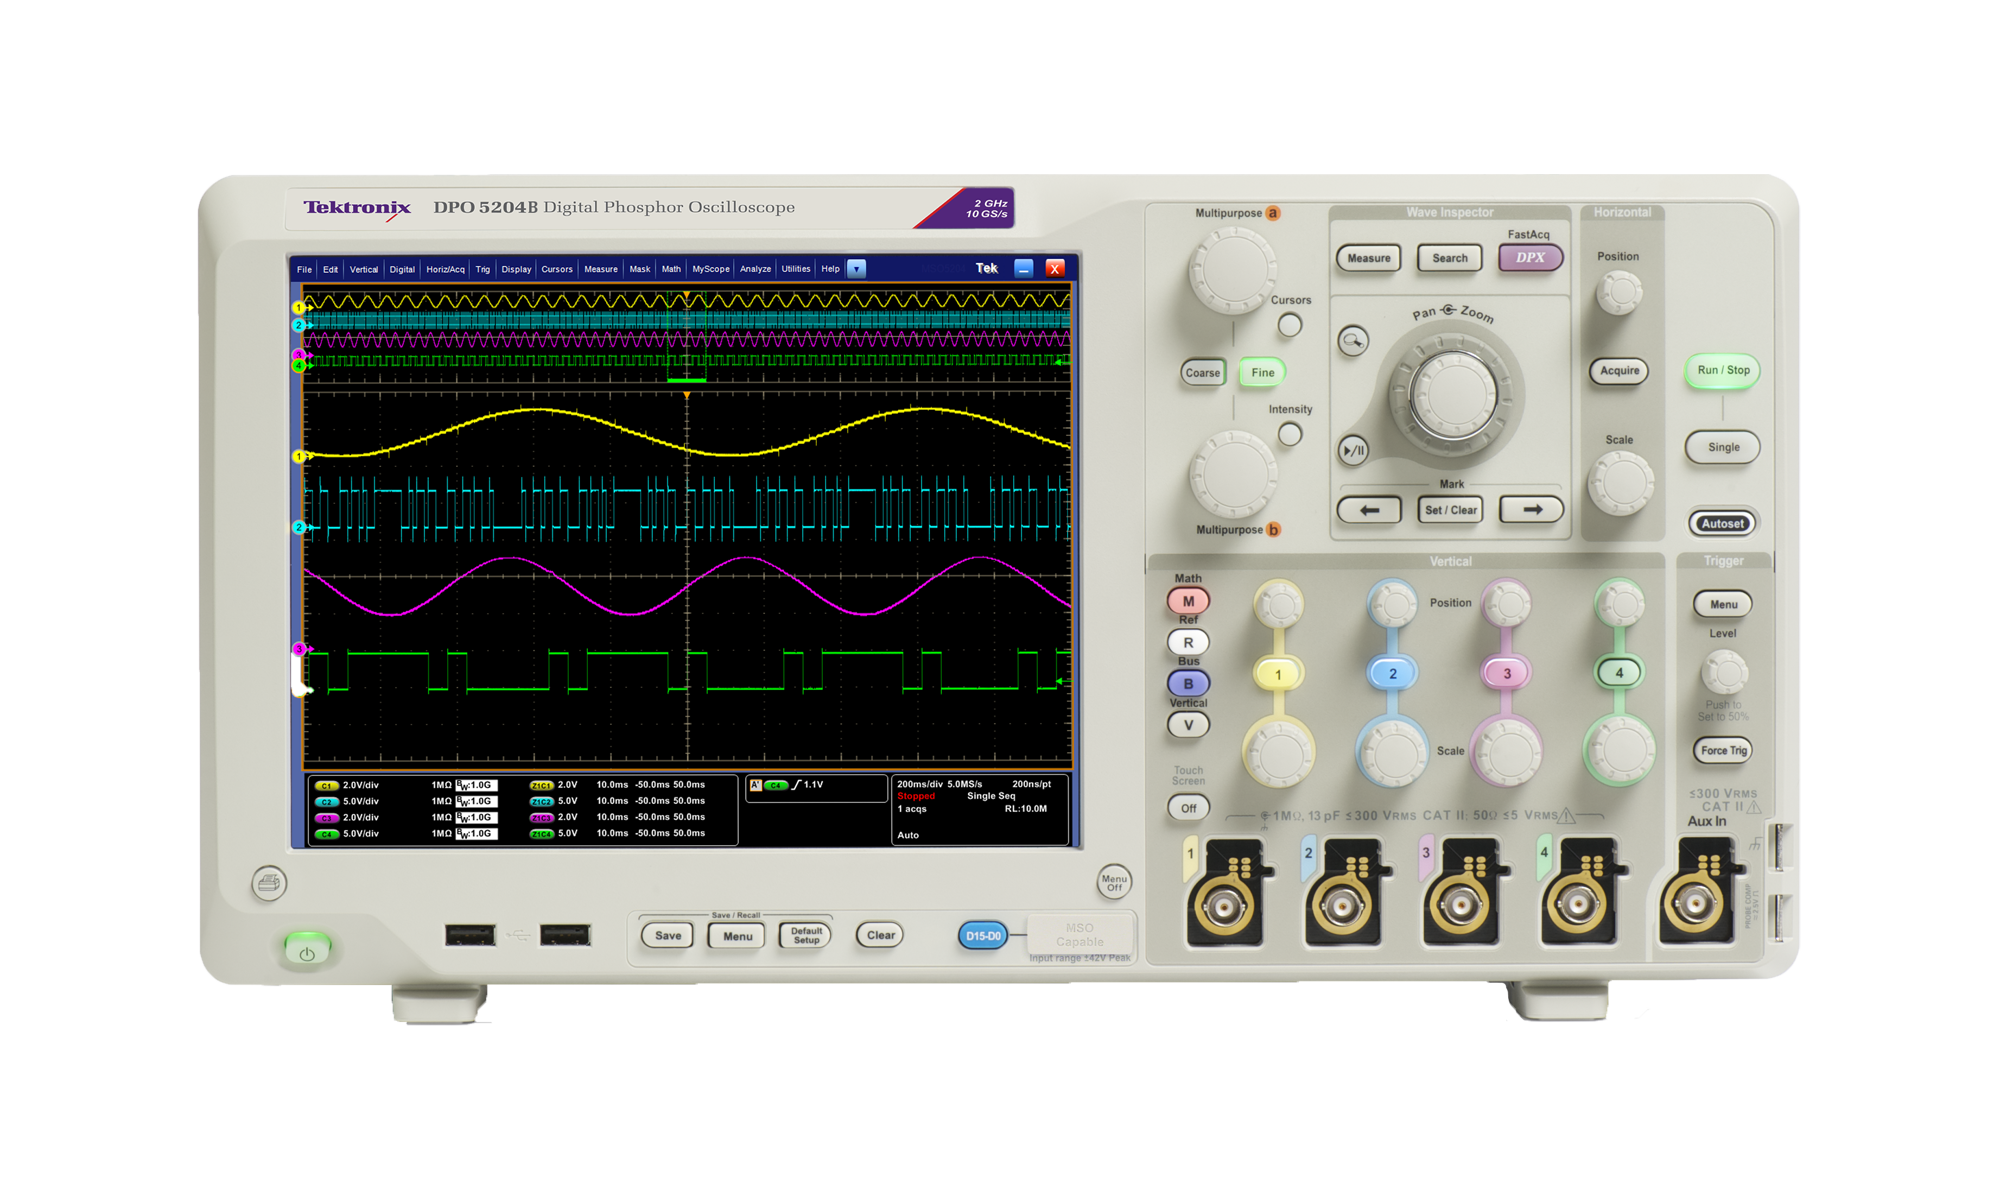 Tektronix DPO/MSO5000B Mixed Signal Oscilloscope